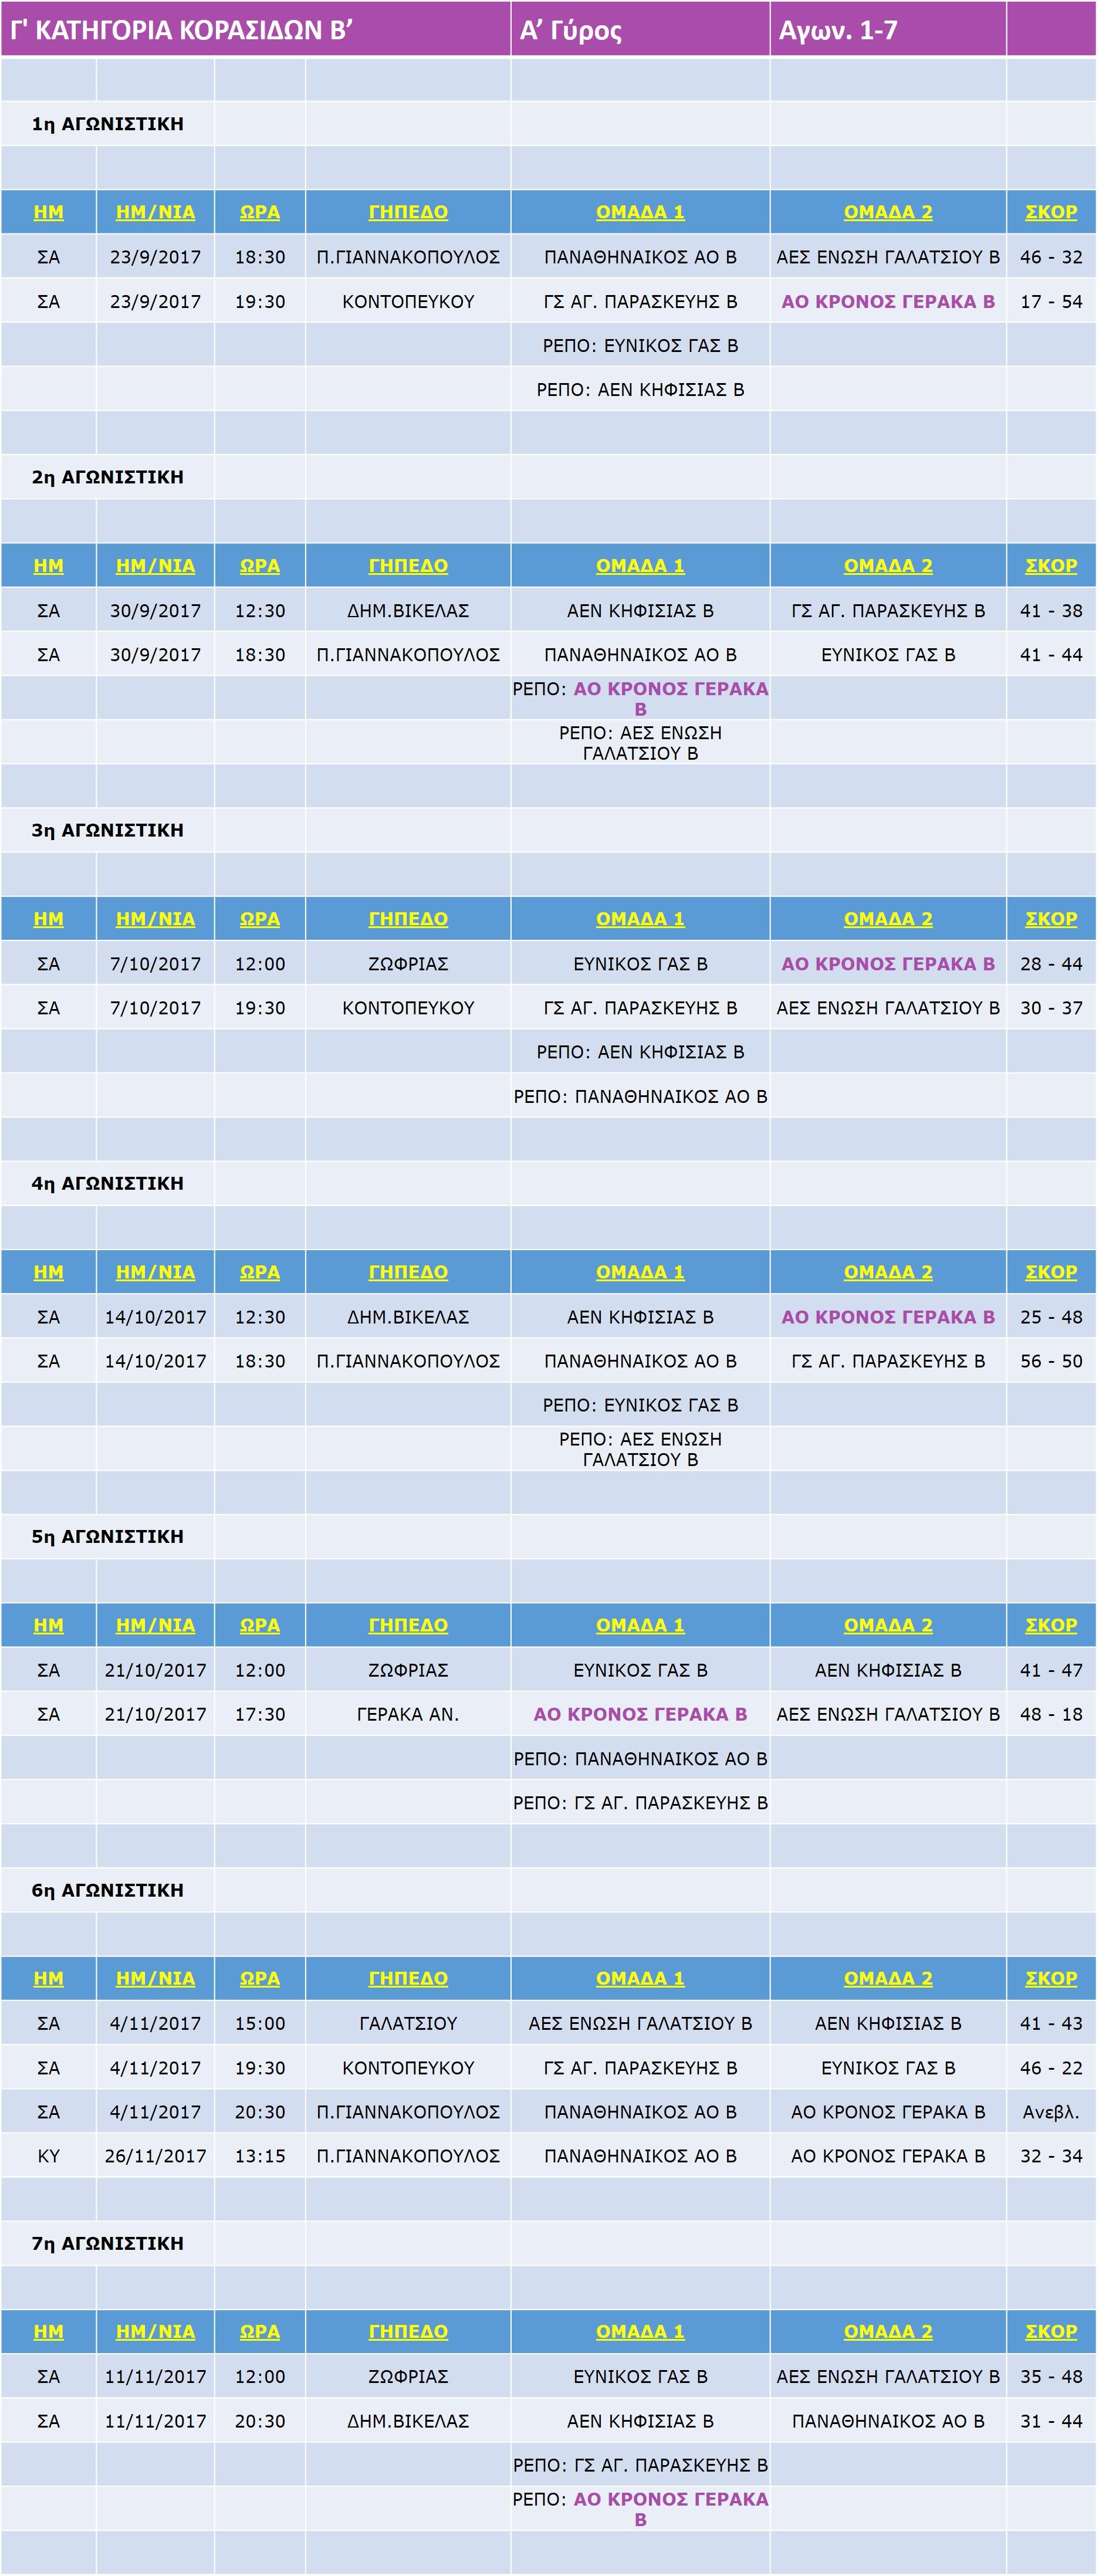 Korasides_Match_B_1-7-6